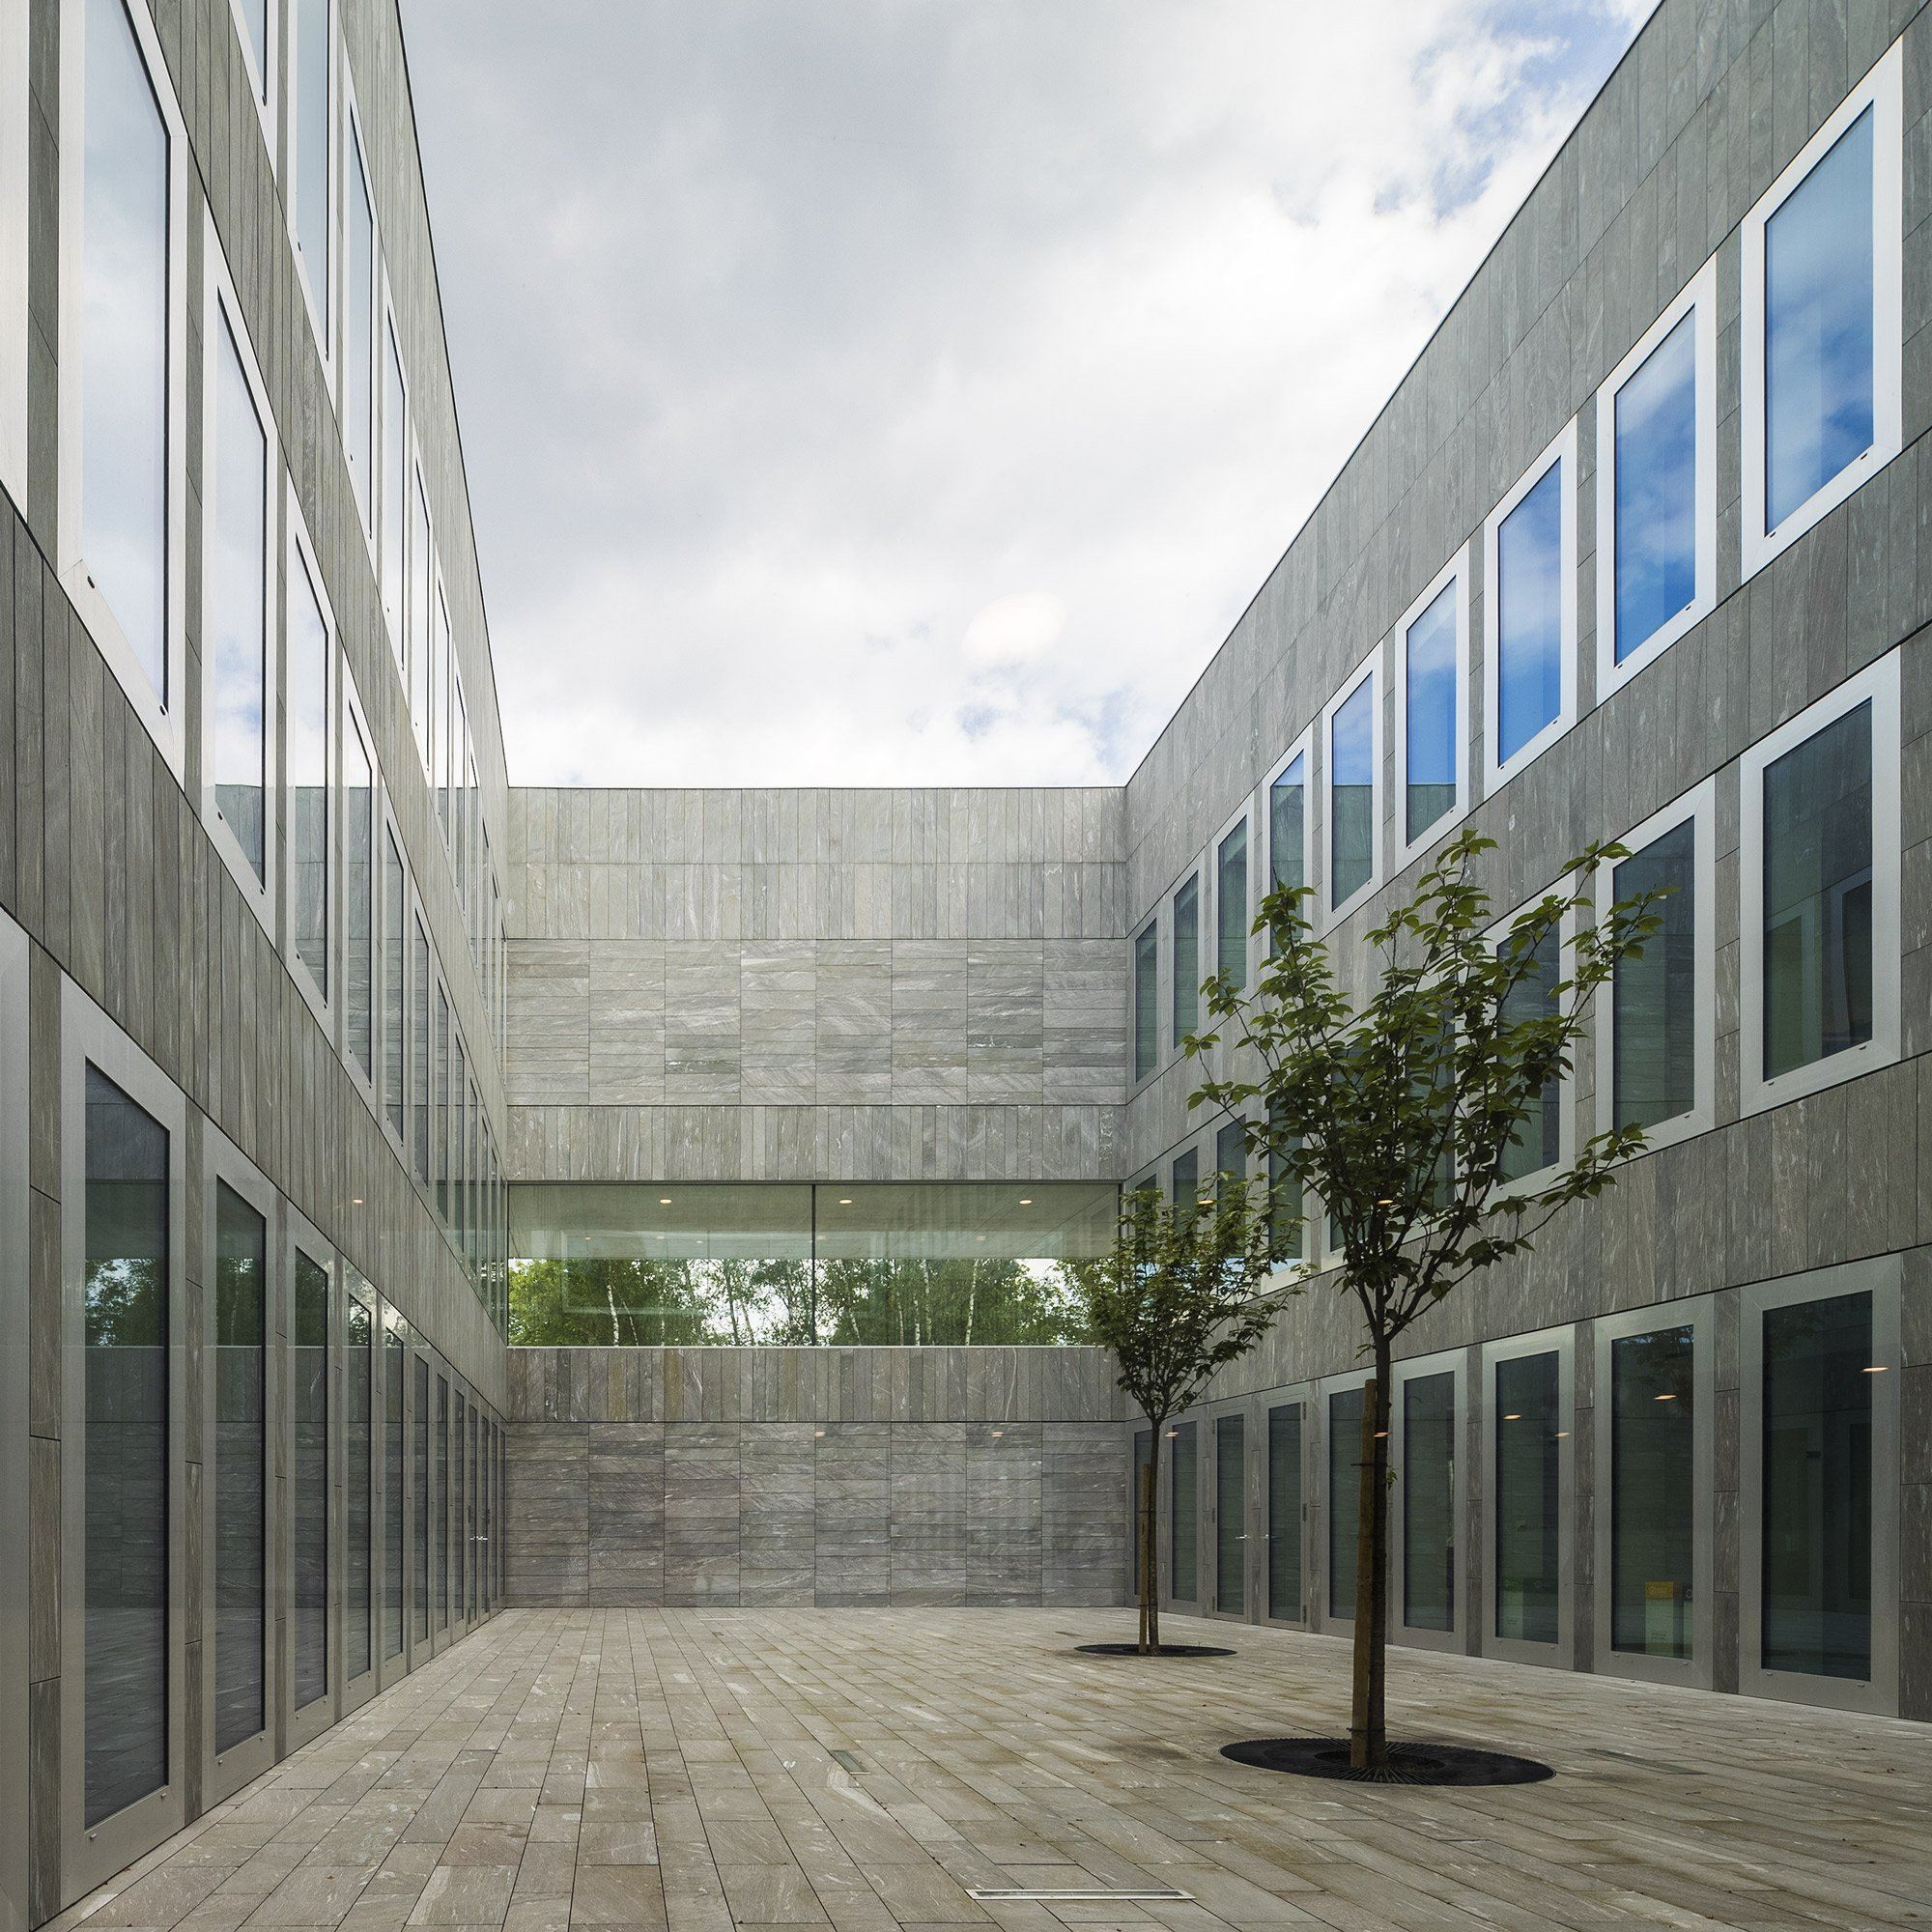 Chambre de Métiers et de l'Artisanat Hauts-De-France ©Fernando Guerra FG+SG, courtesy Kaan Architecten and PDAA